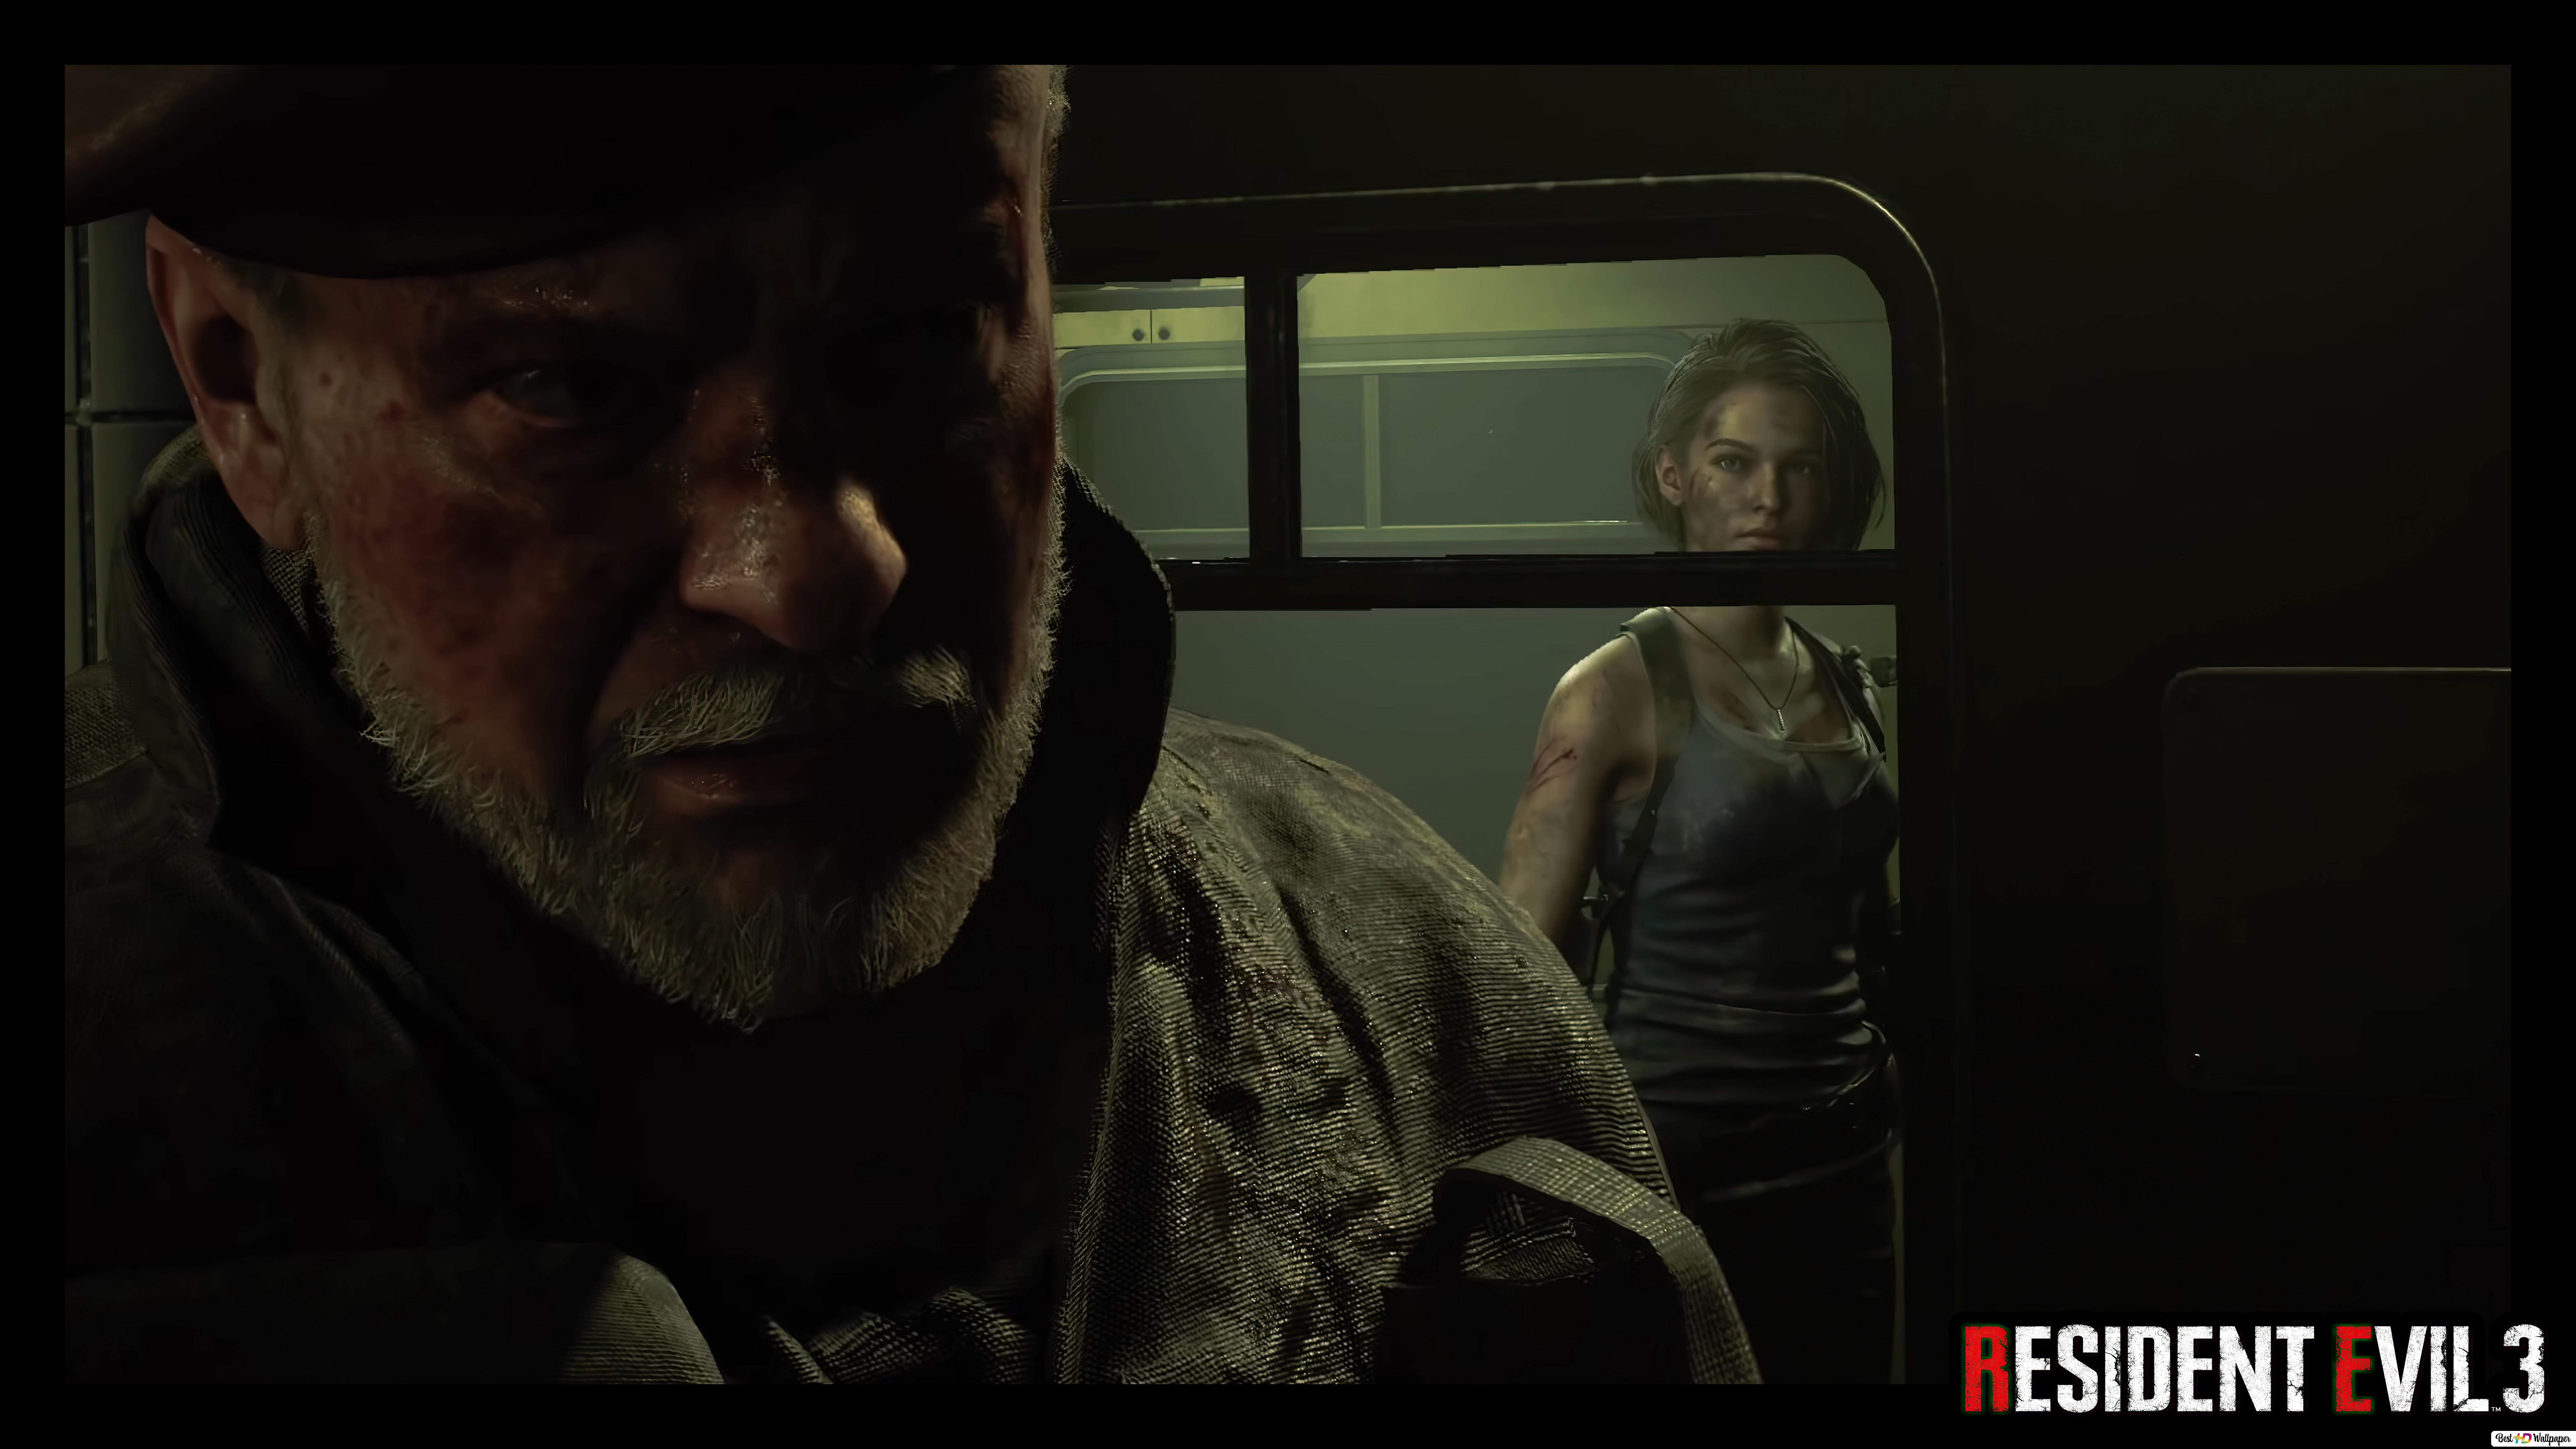 Resident Evil 3 Remake 09 8k 4k Wallpaper Hd Wallpaper Download